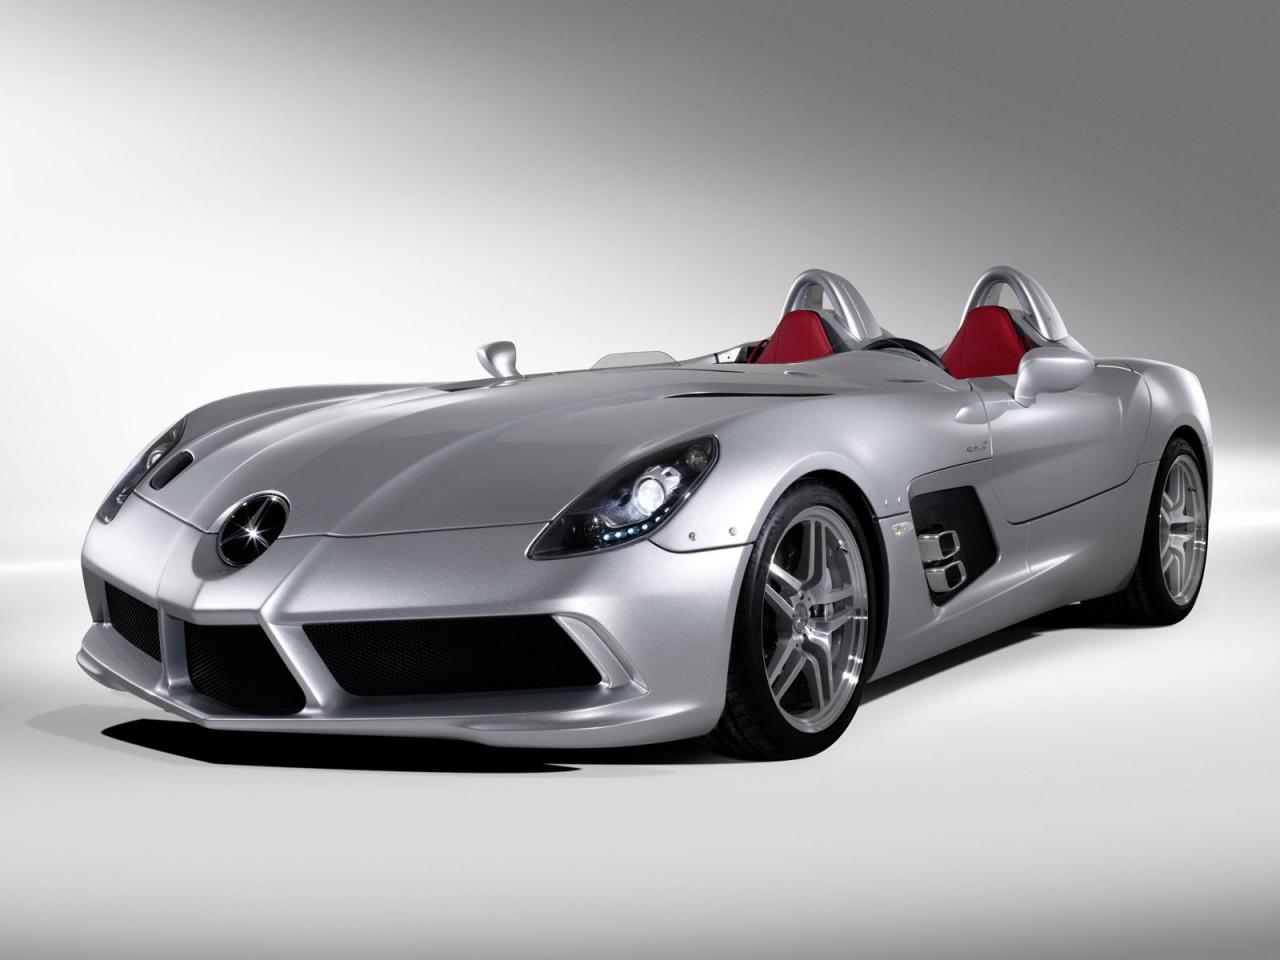 http://3.bp.blogspot.com/-Q-kVEAAAWGw/TiouyQm3PTI/AAAAAAAAC9Q/j7Z3U5-HbsY/s1600/Mercedes%20benz%20car%20wallpaper-1.jpg